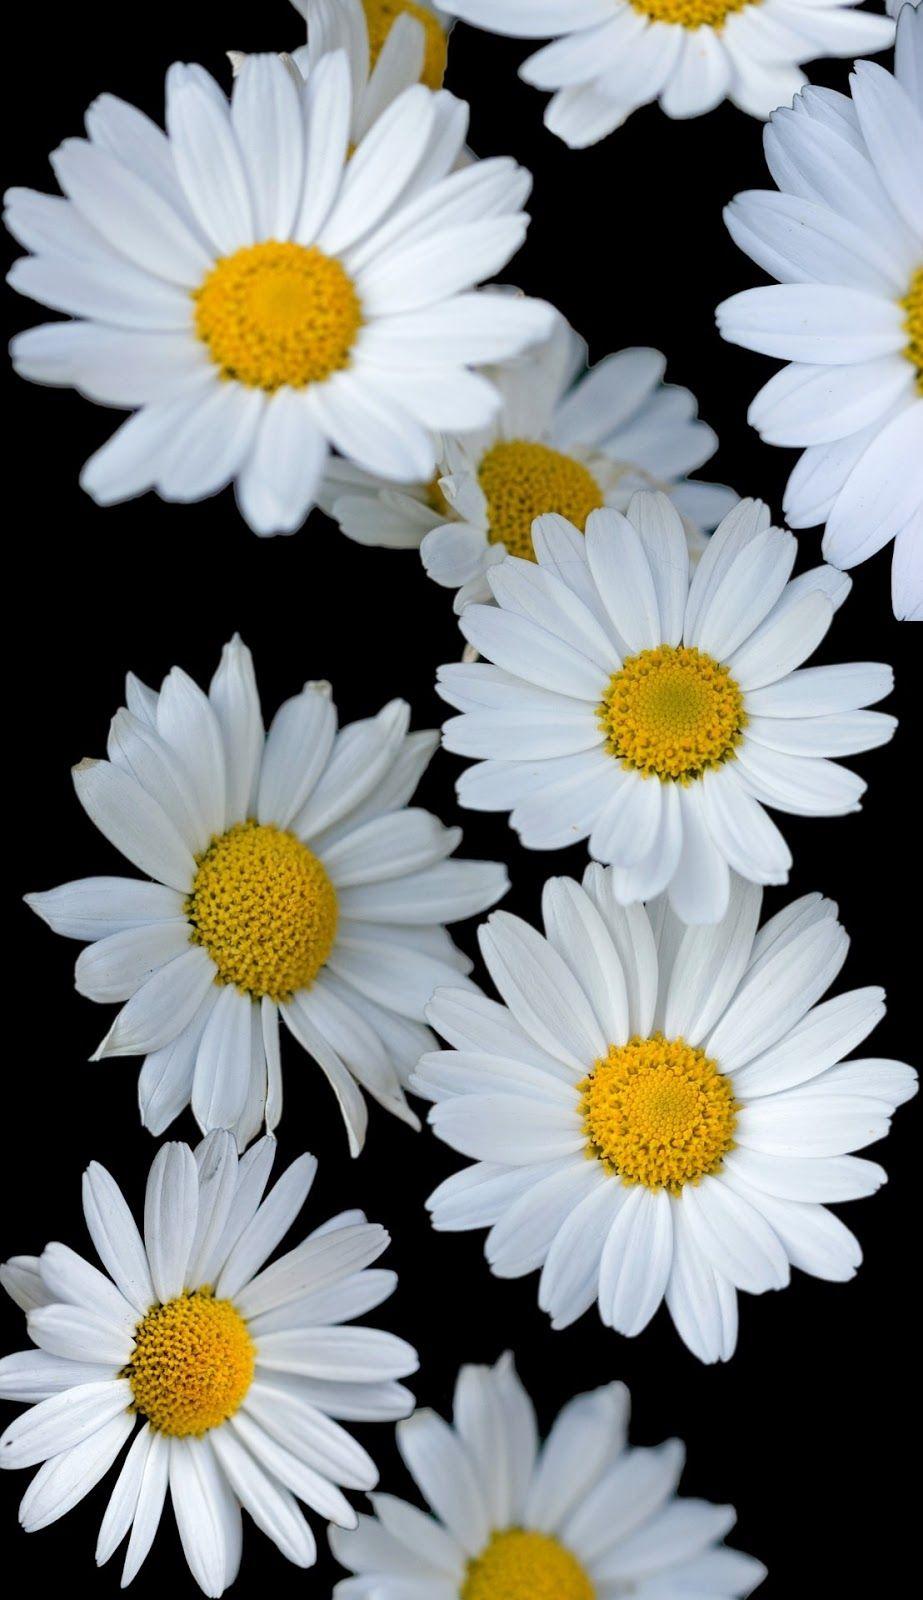 White Sunflower In Black Background In 2020 White Sunflowers